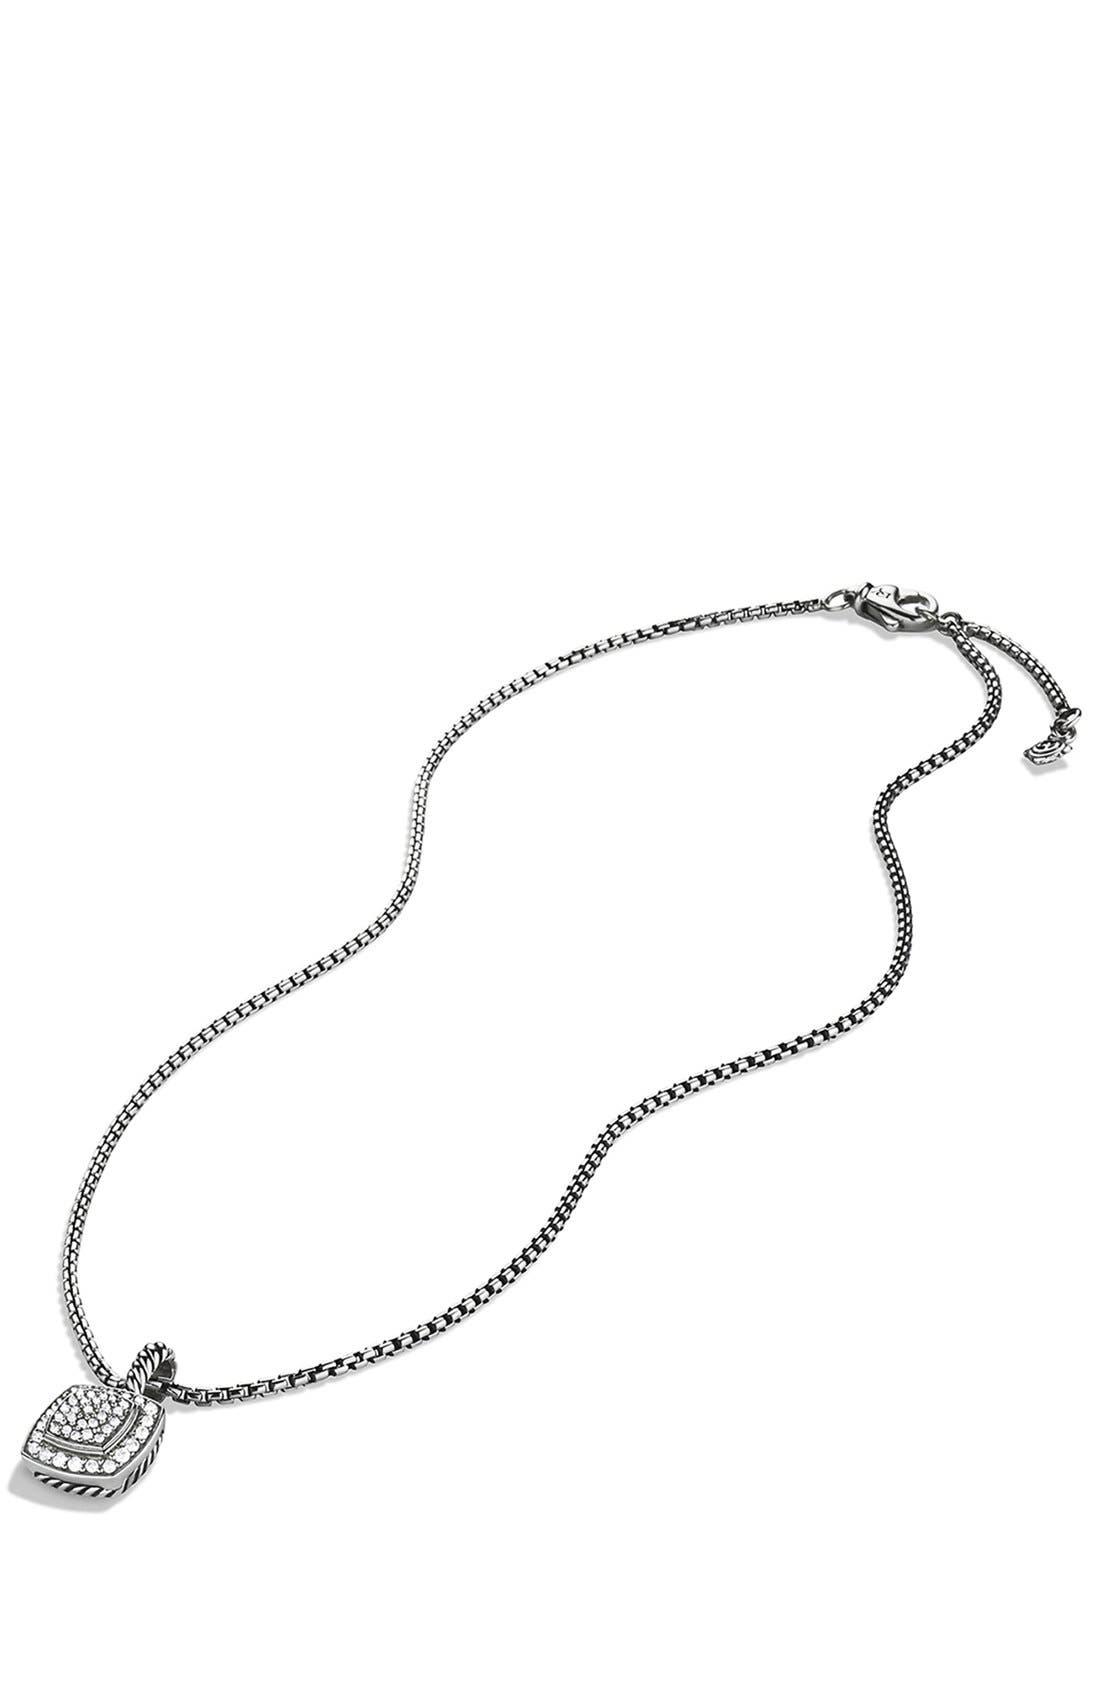 'Albion' Petite Pendant with Diamonds on Chain,                             Alternate thumbnail 3, color,                             Diamond